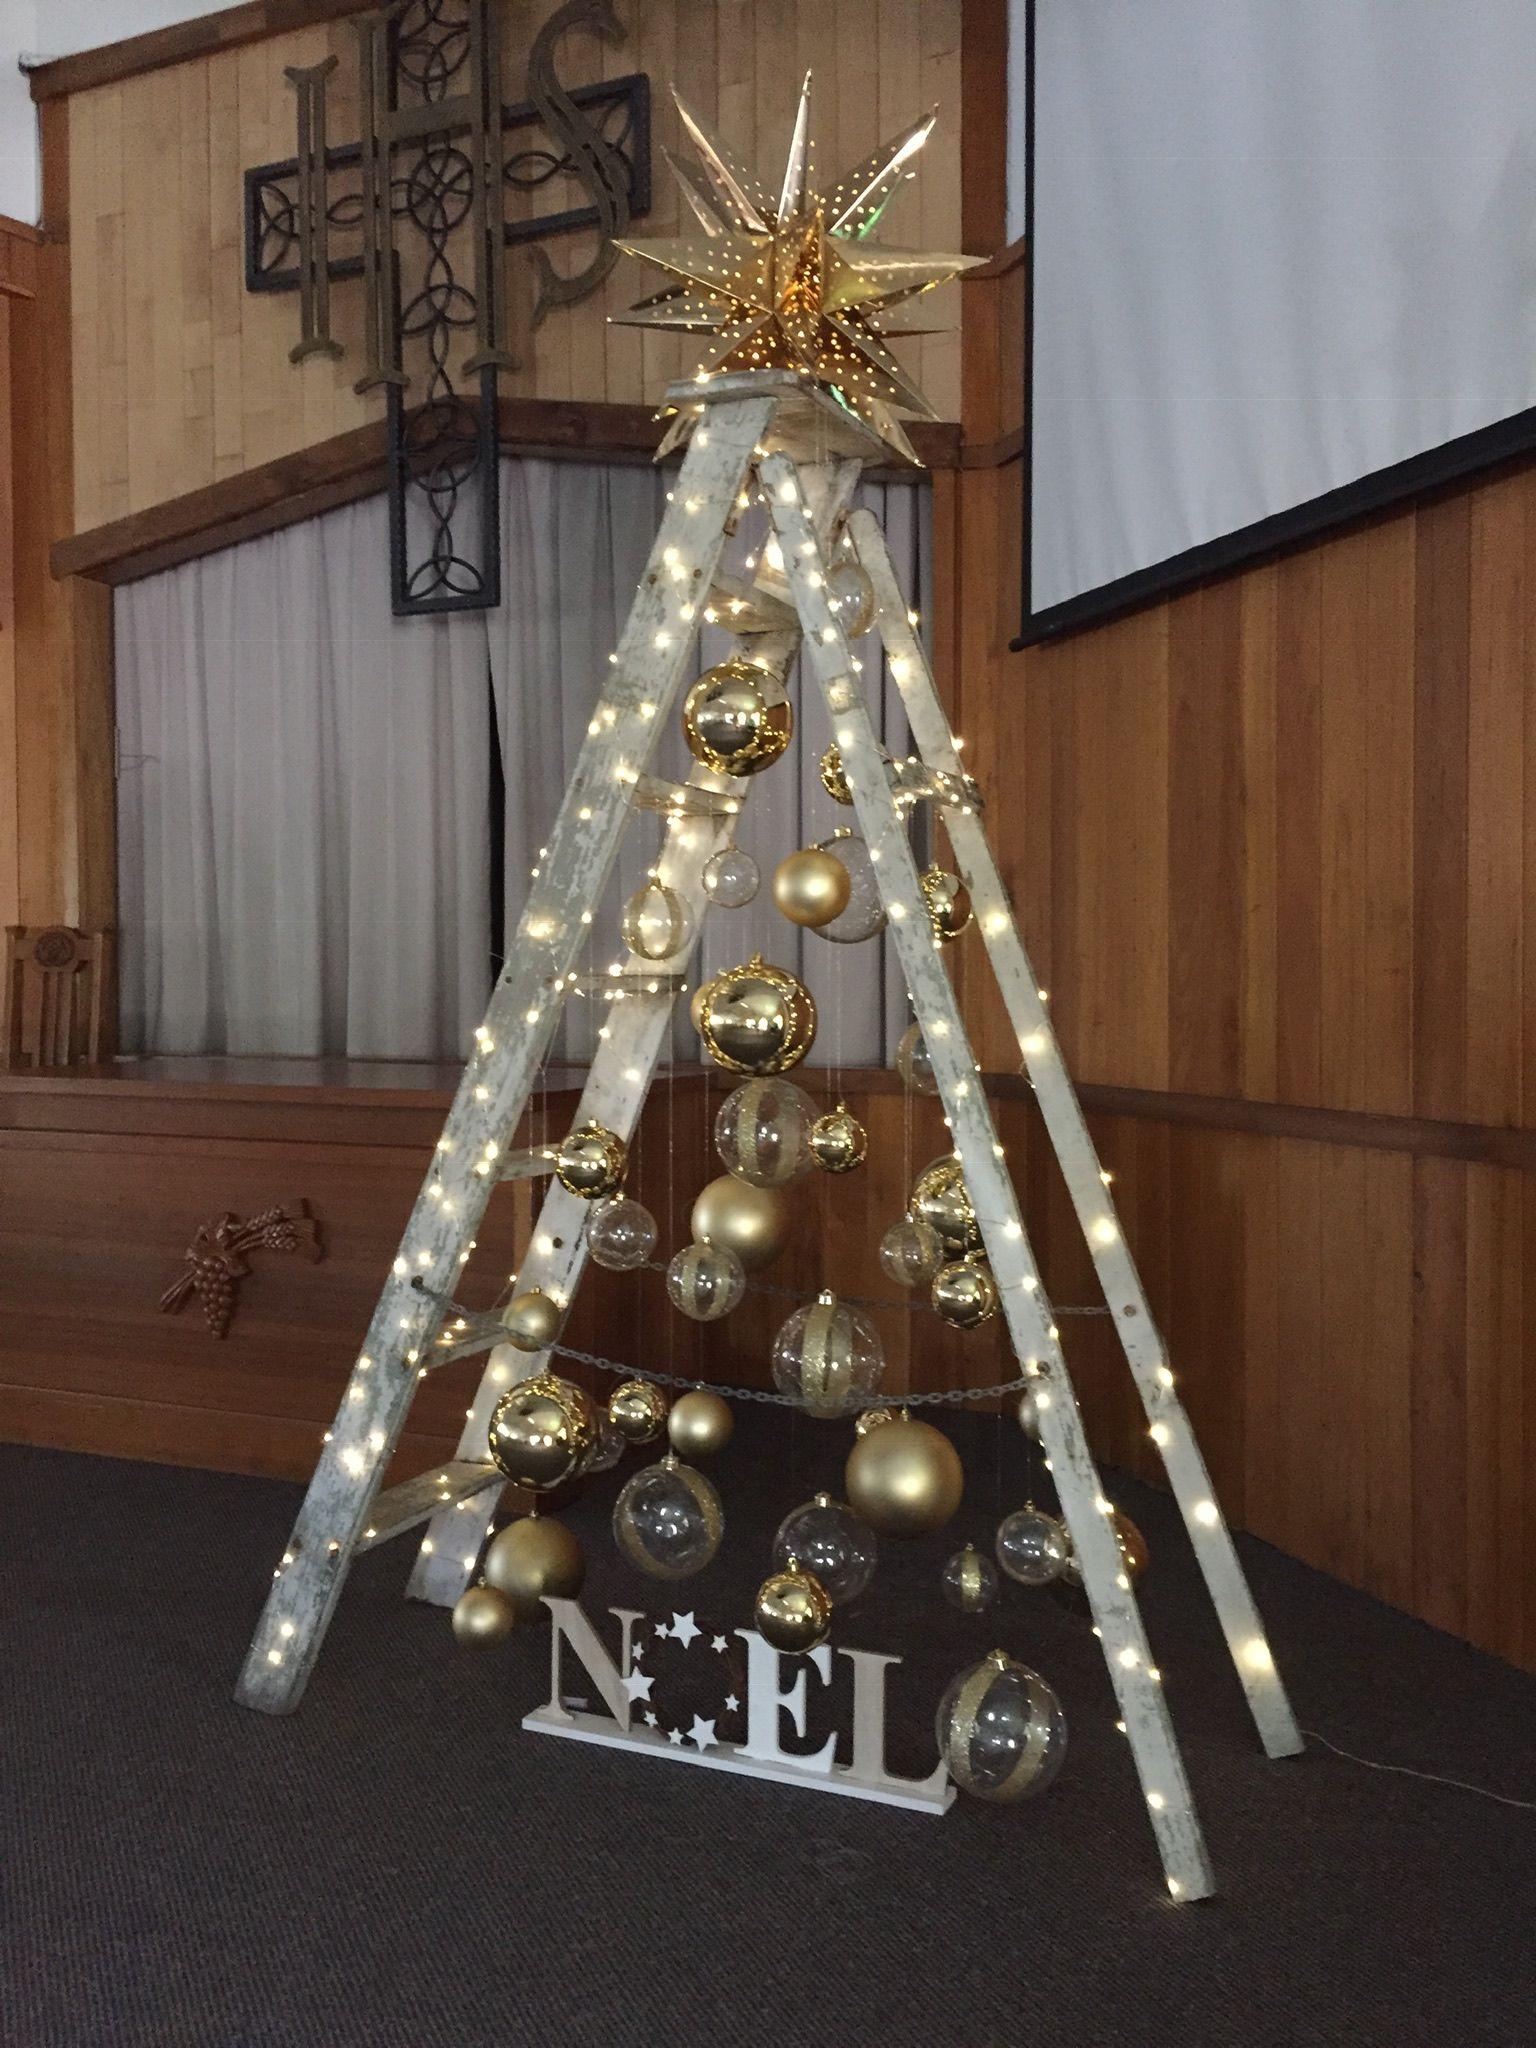 Leasing Weihnachtsbaum.Ladder Christmas Tree By Toni Williams Christmas Weihnachtsbaum